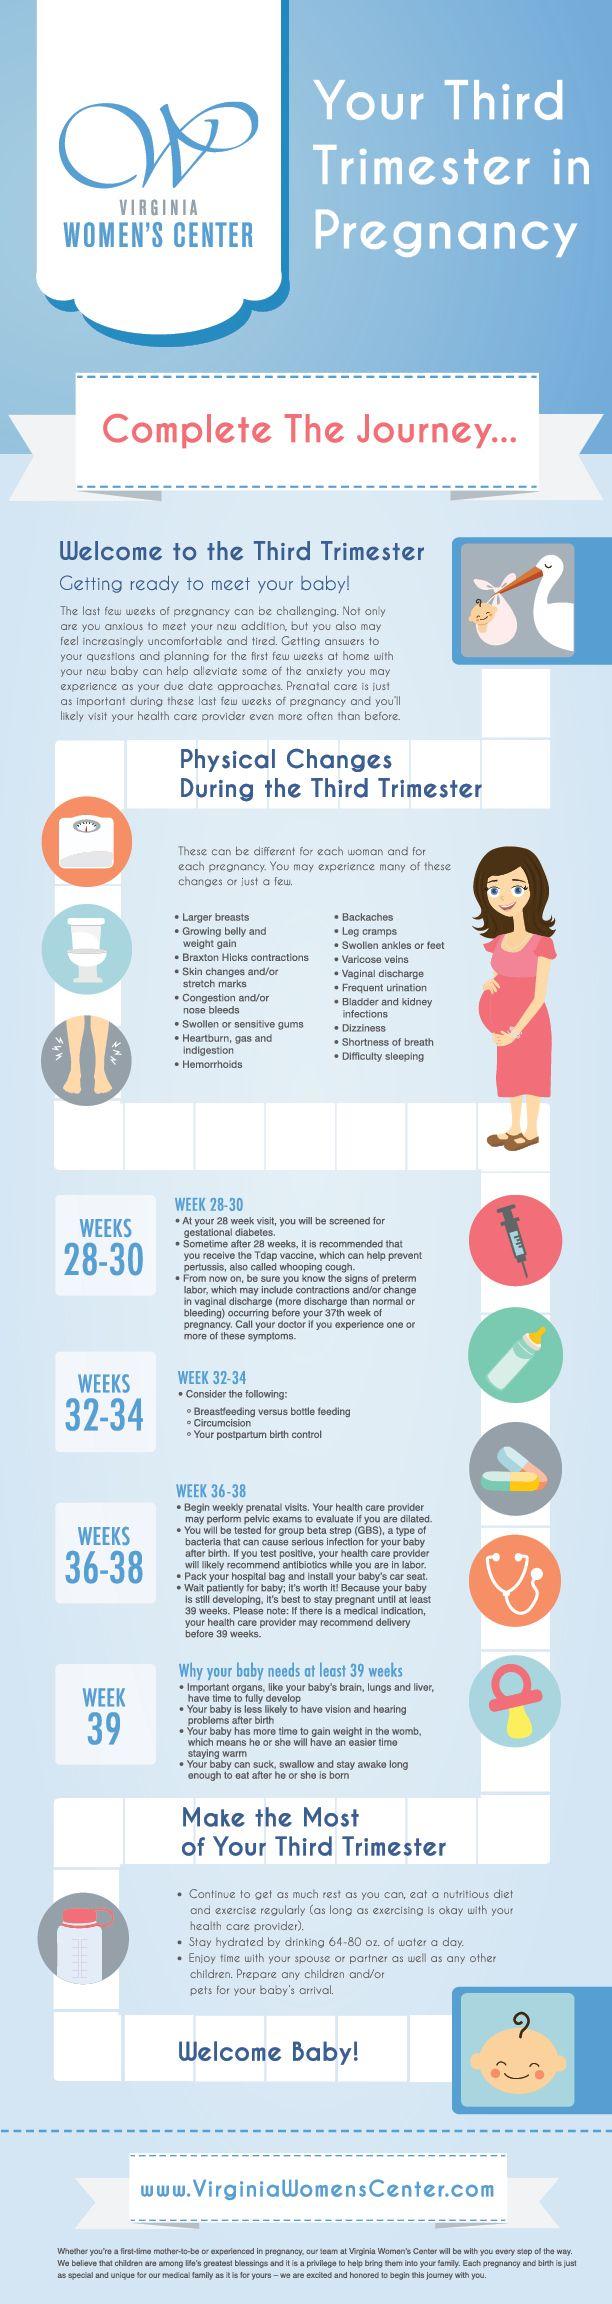 Pin by Virginia Women's Center on Wellness Tips for Women ...